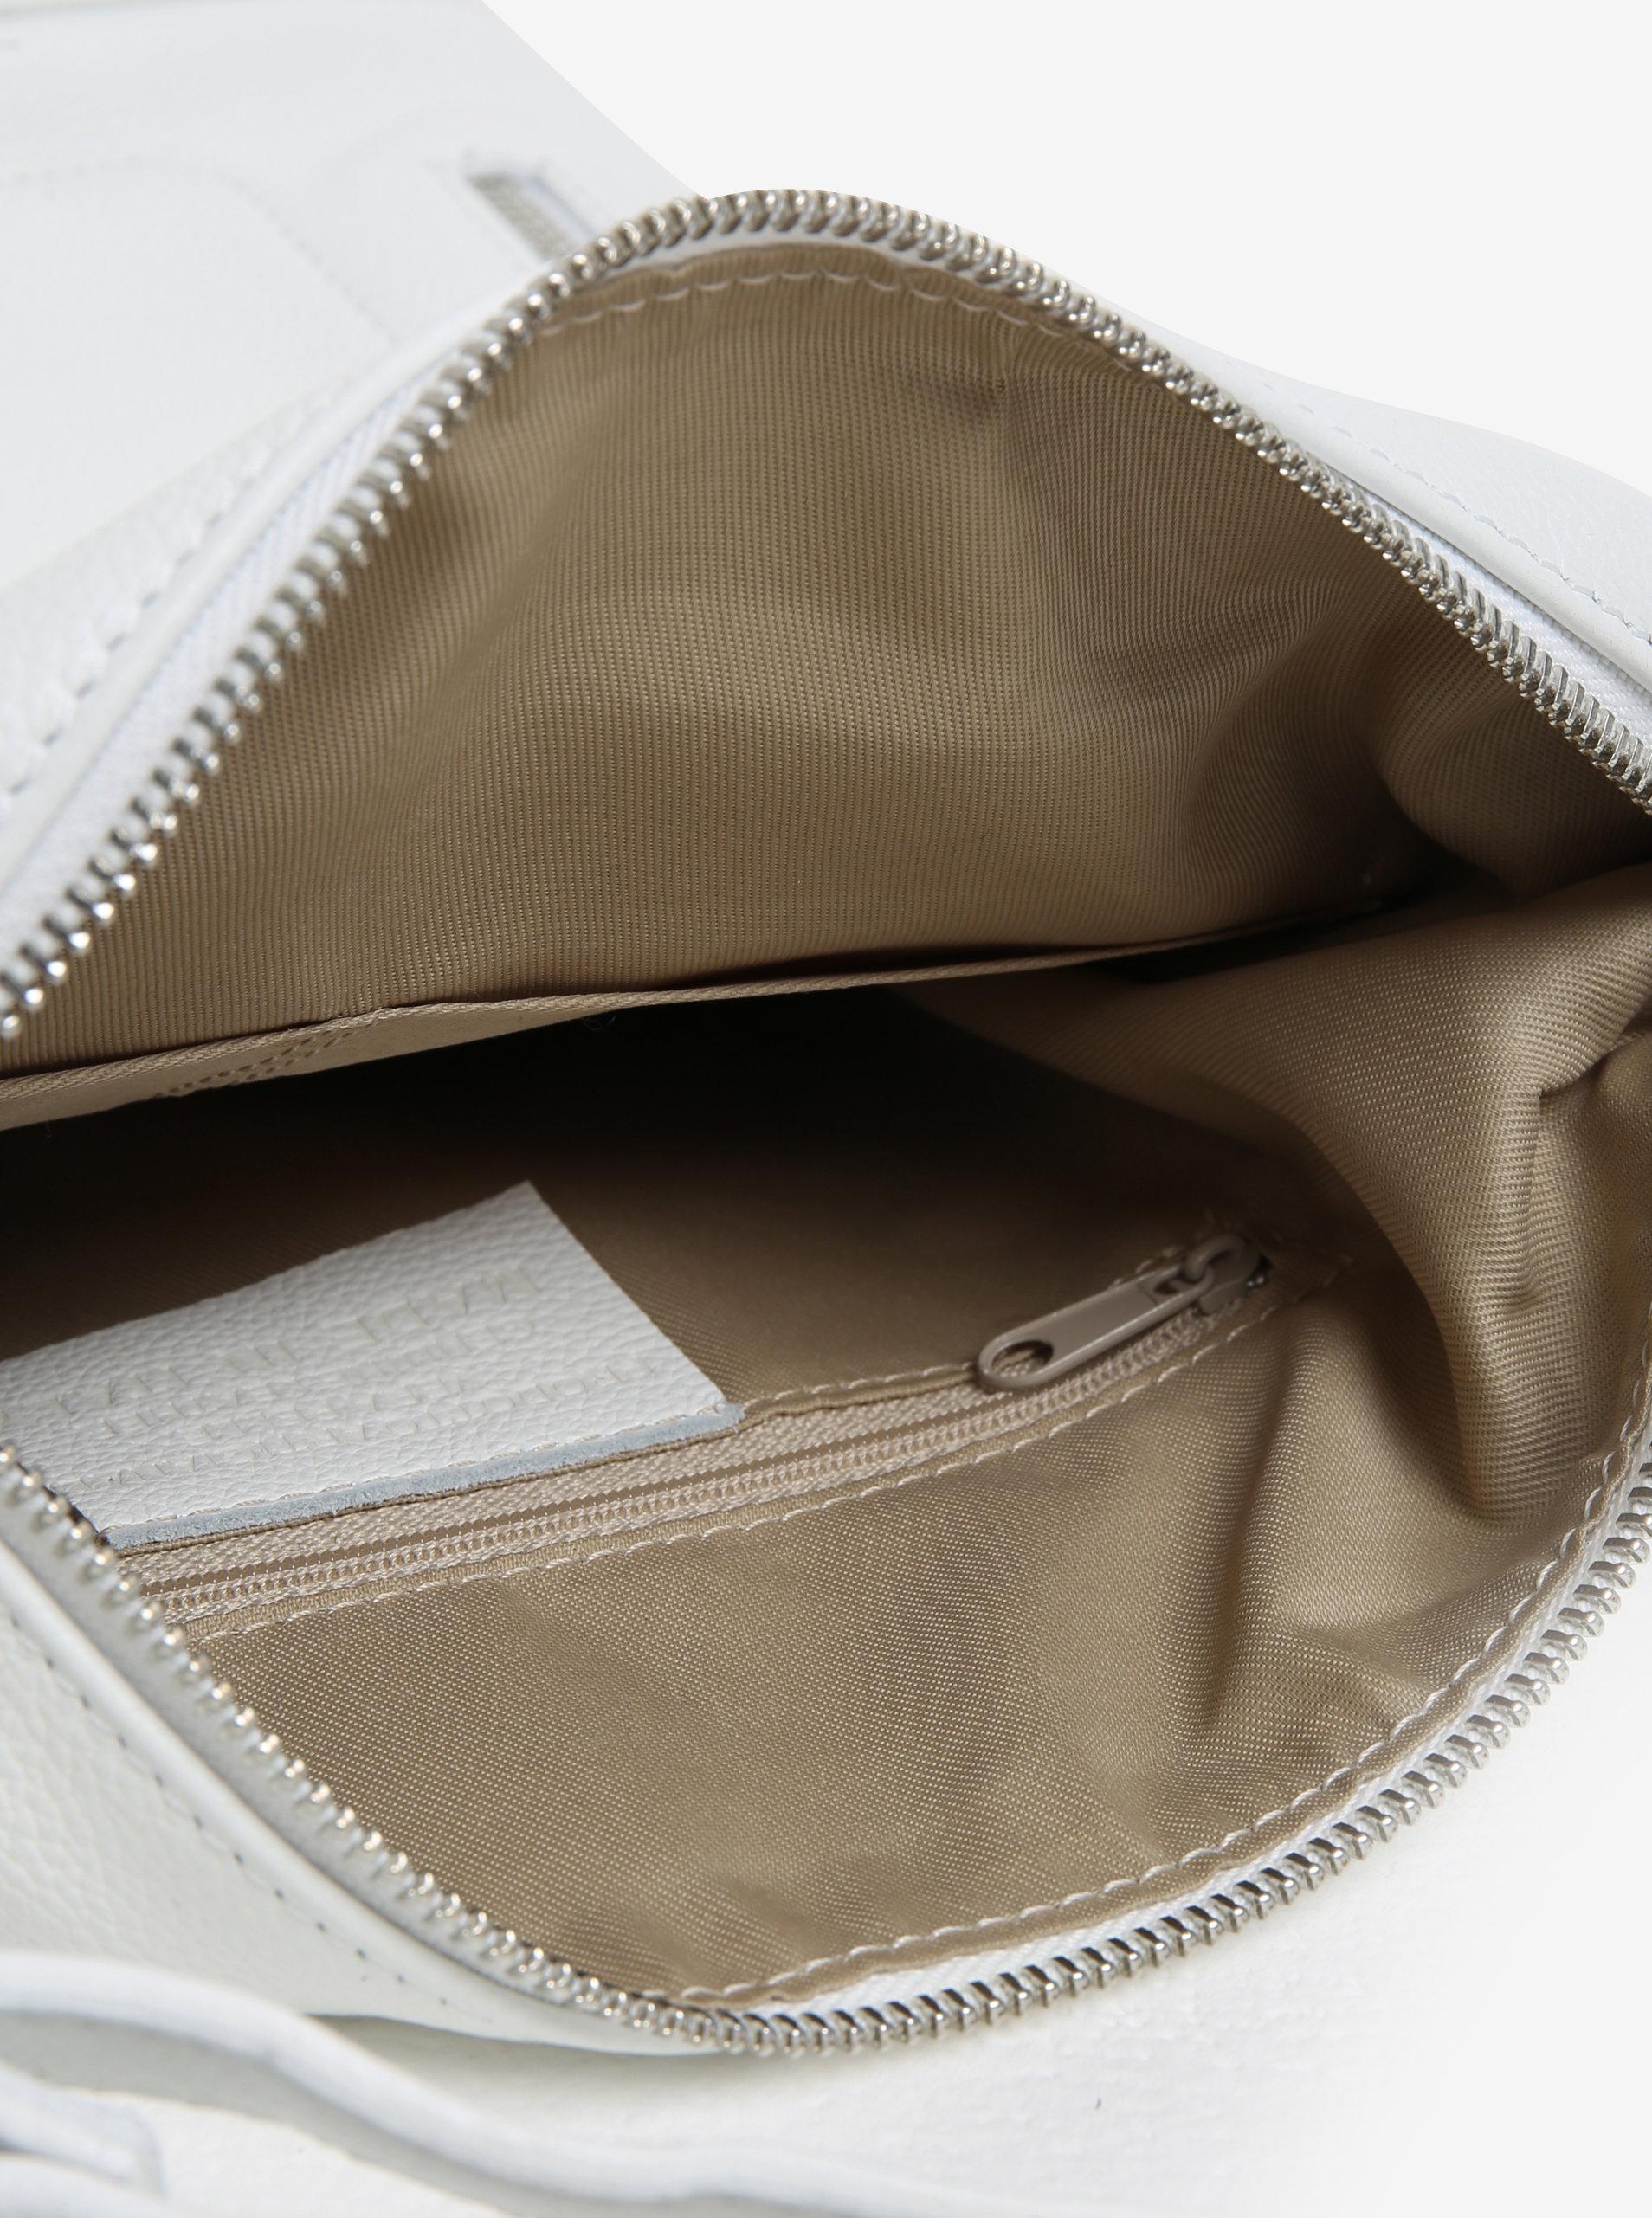 Biela dámska kožená kabelka s vreckami KARA ... d70fcd0c347